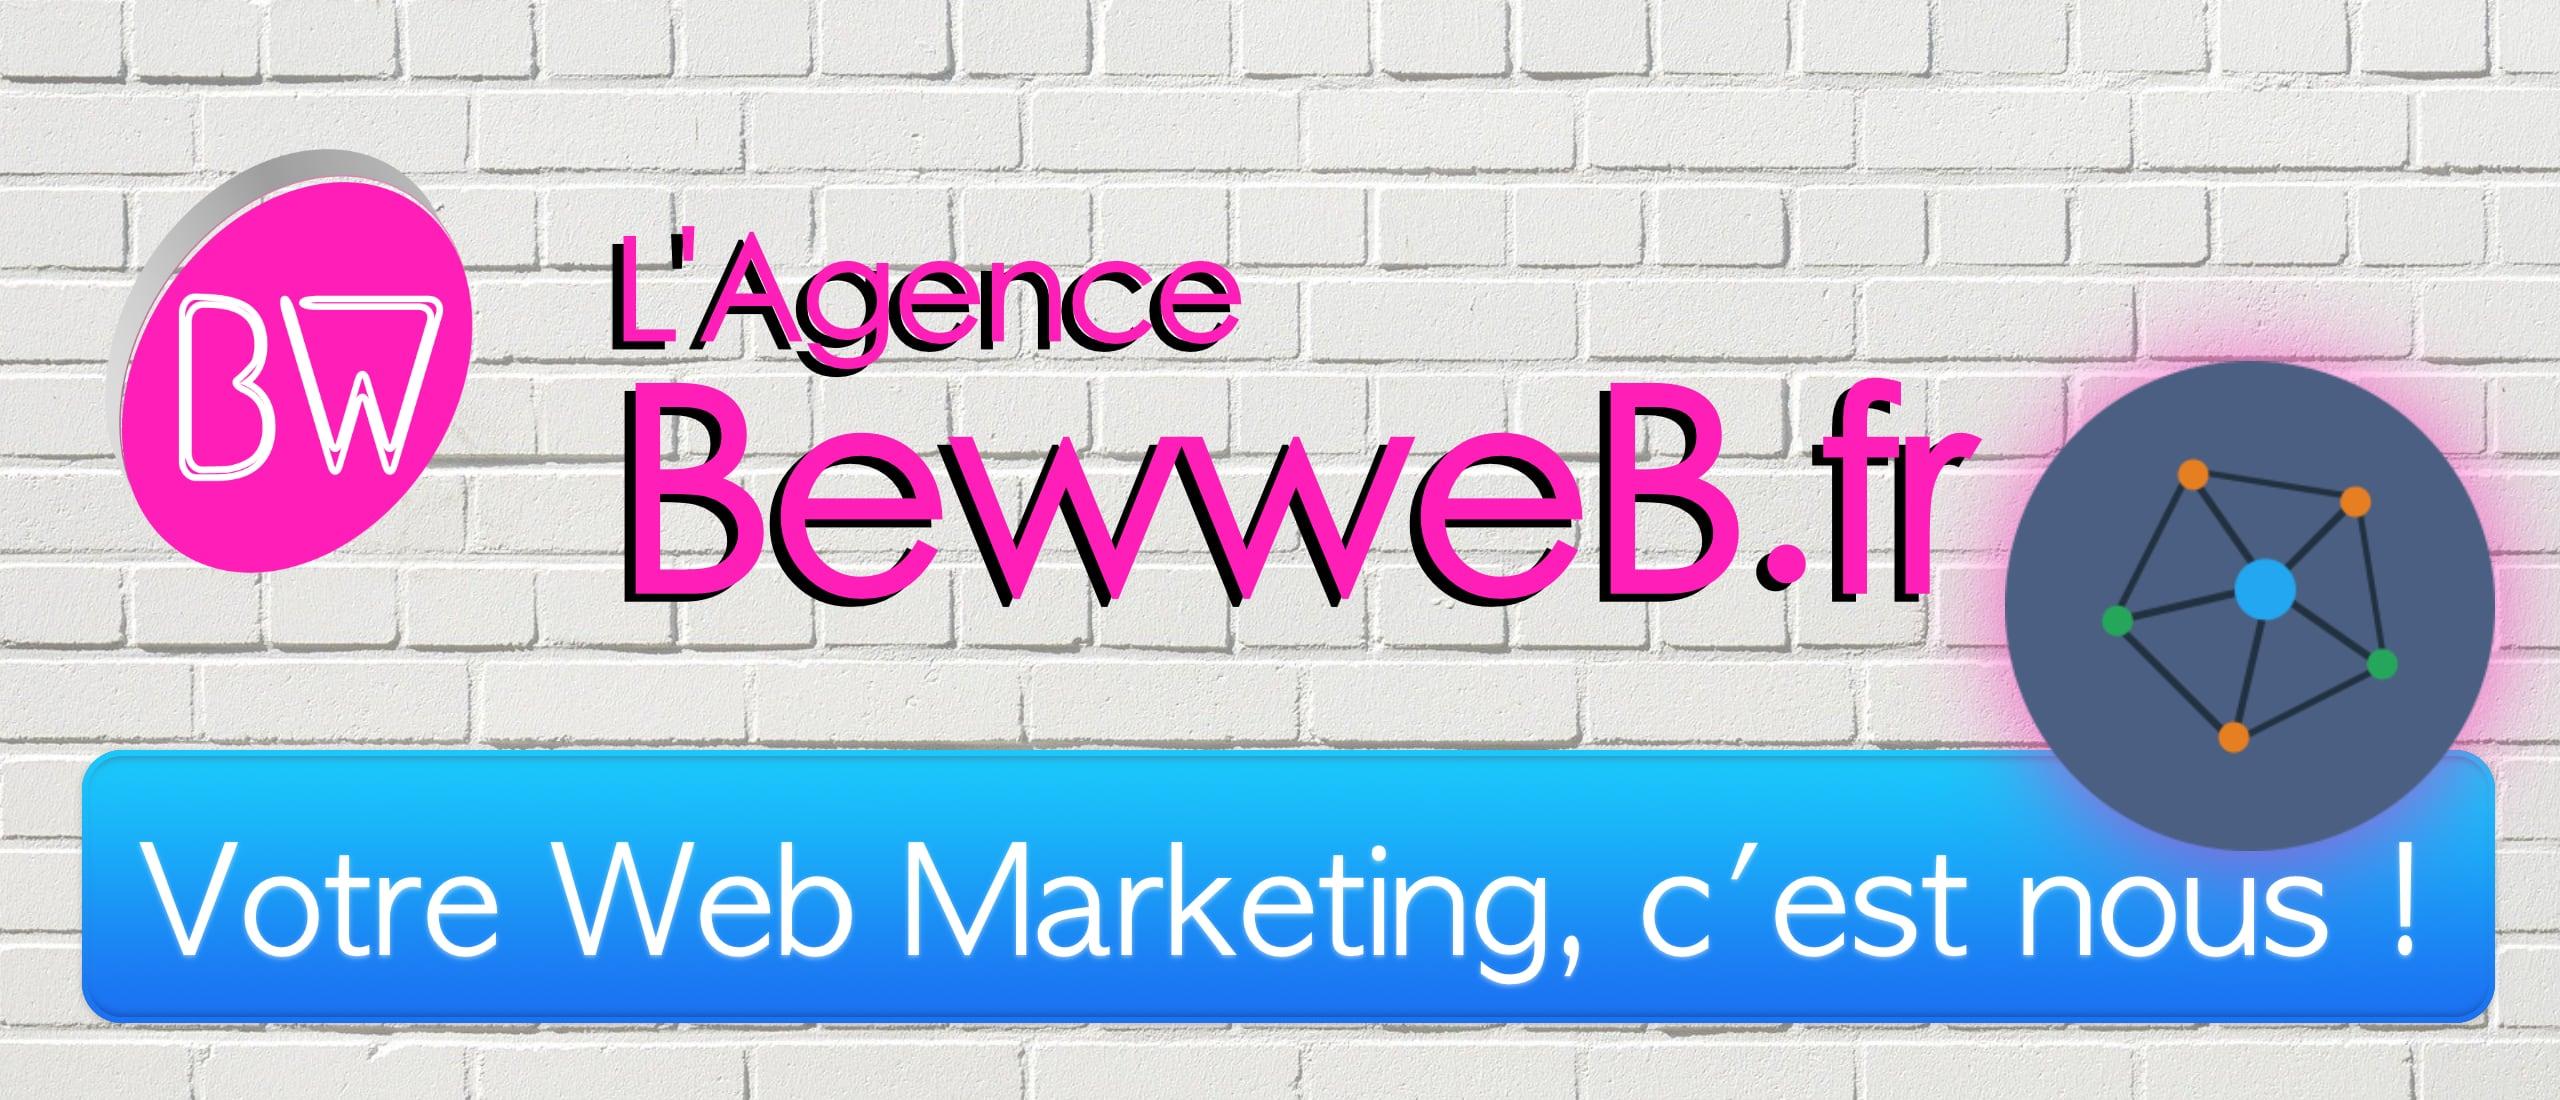 Entête site BewweB.fr WebMarketing